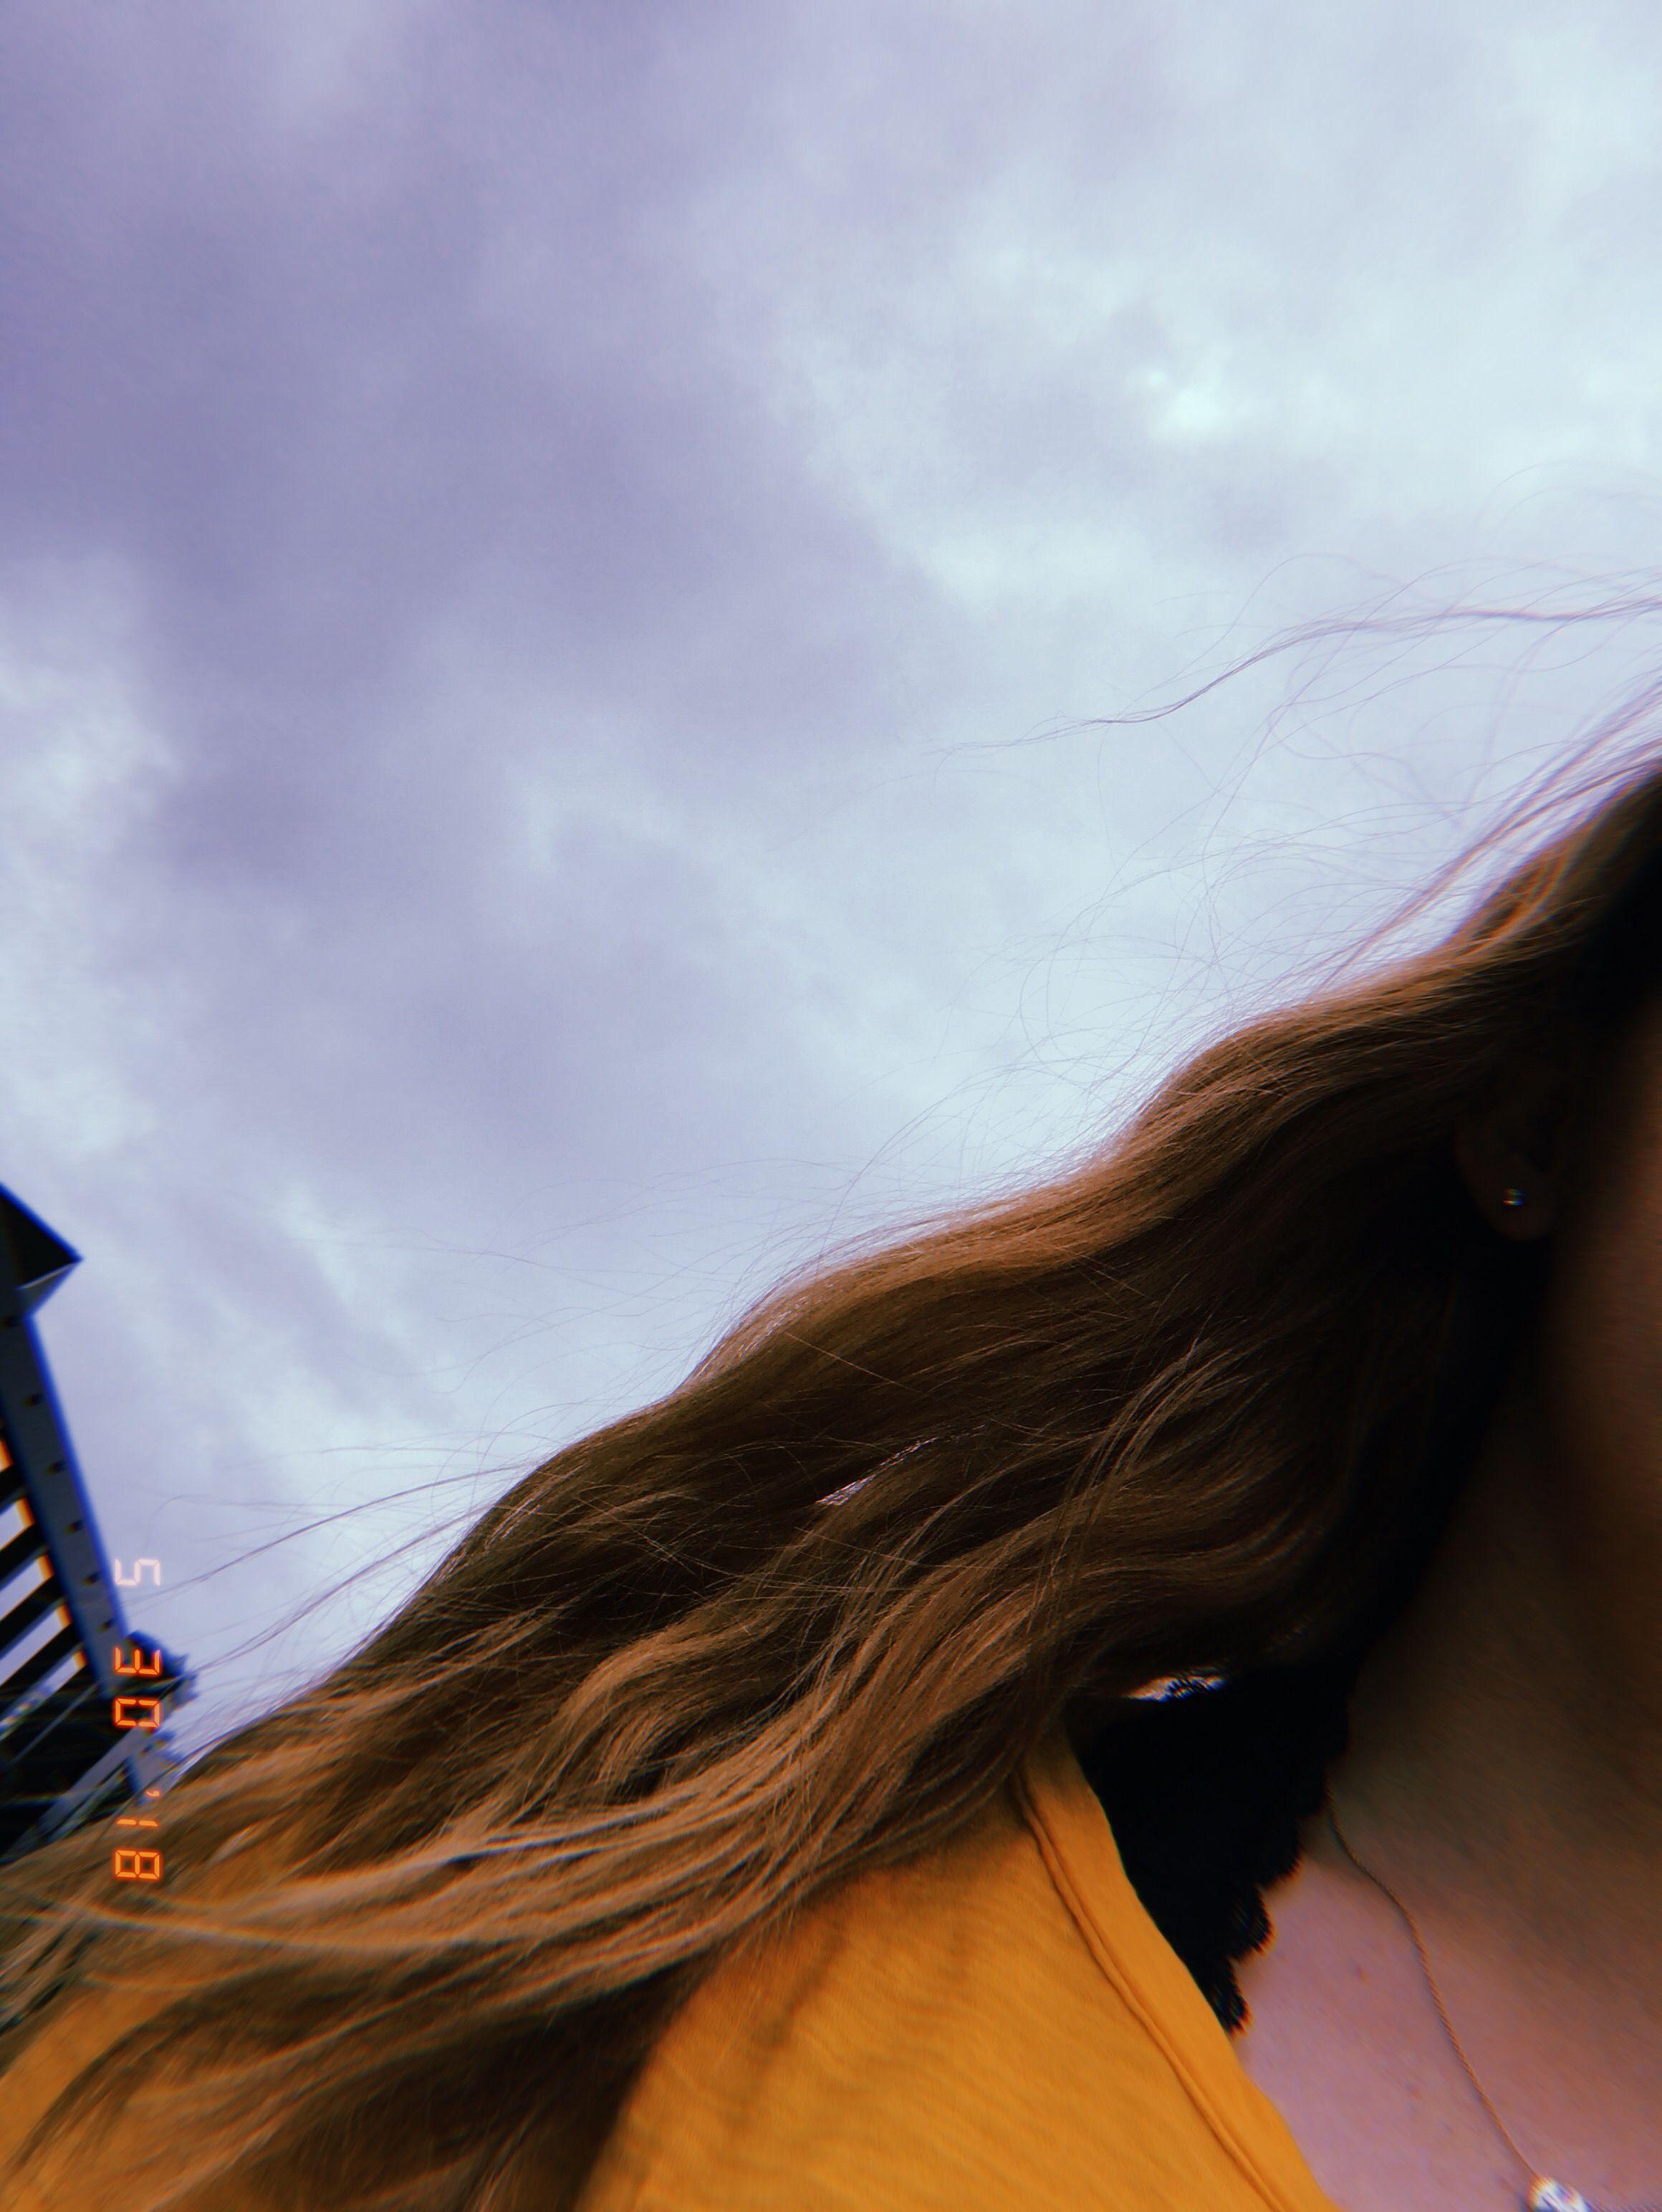 huji cam | huji | Camera selfie, Photography, Photography poses